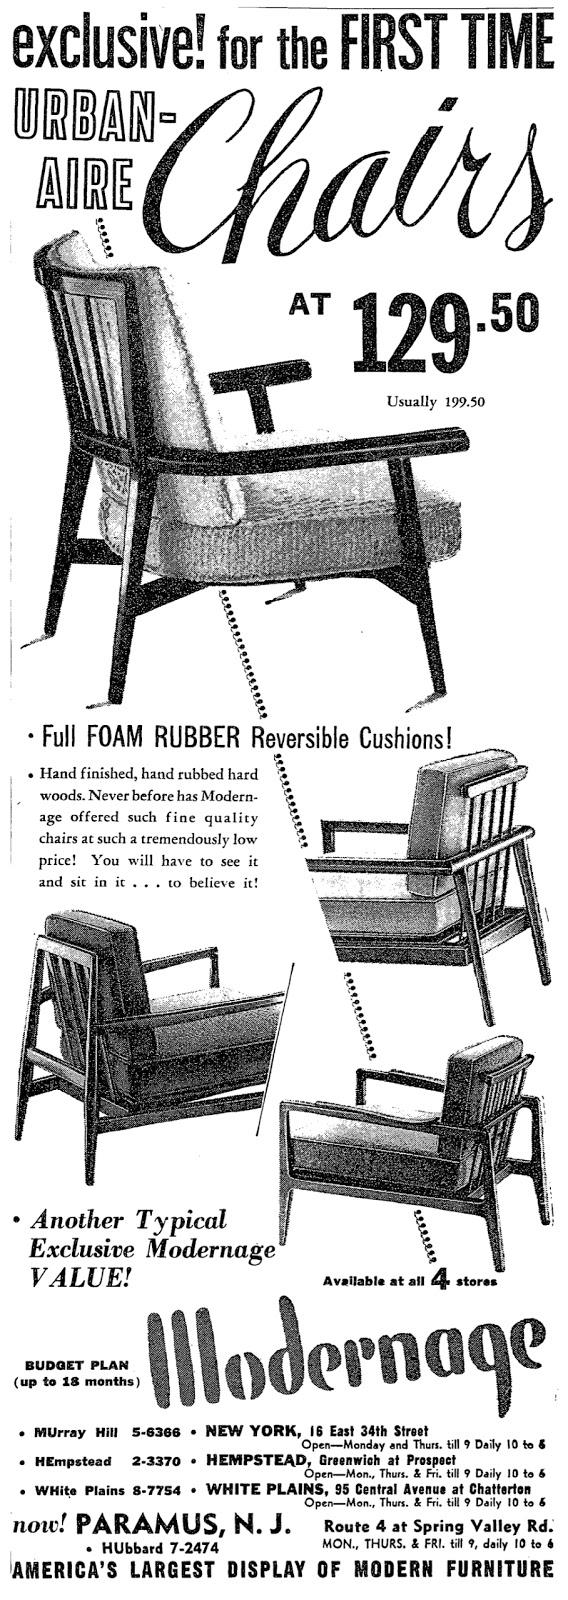 gerards furniture. Gerards Furniture. Furniture